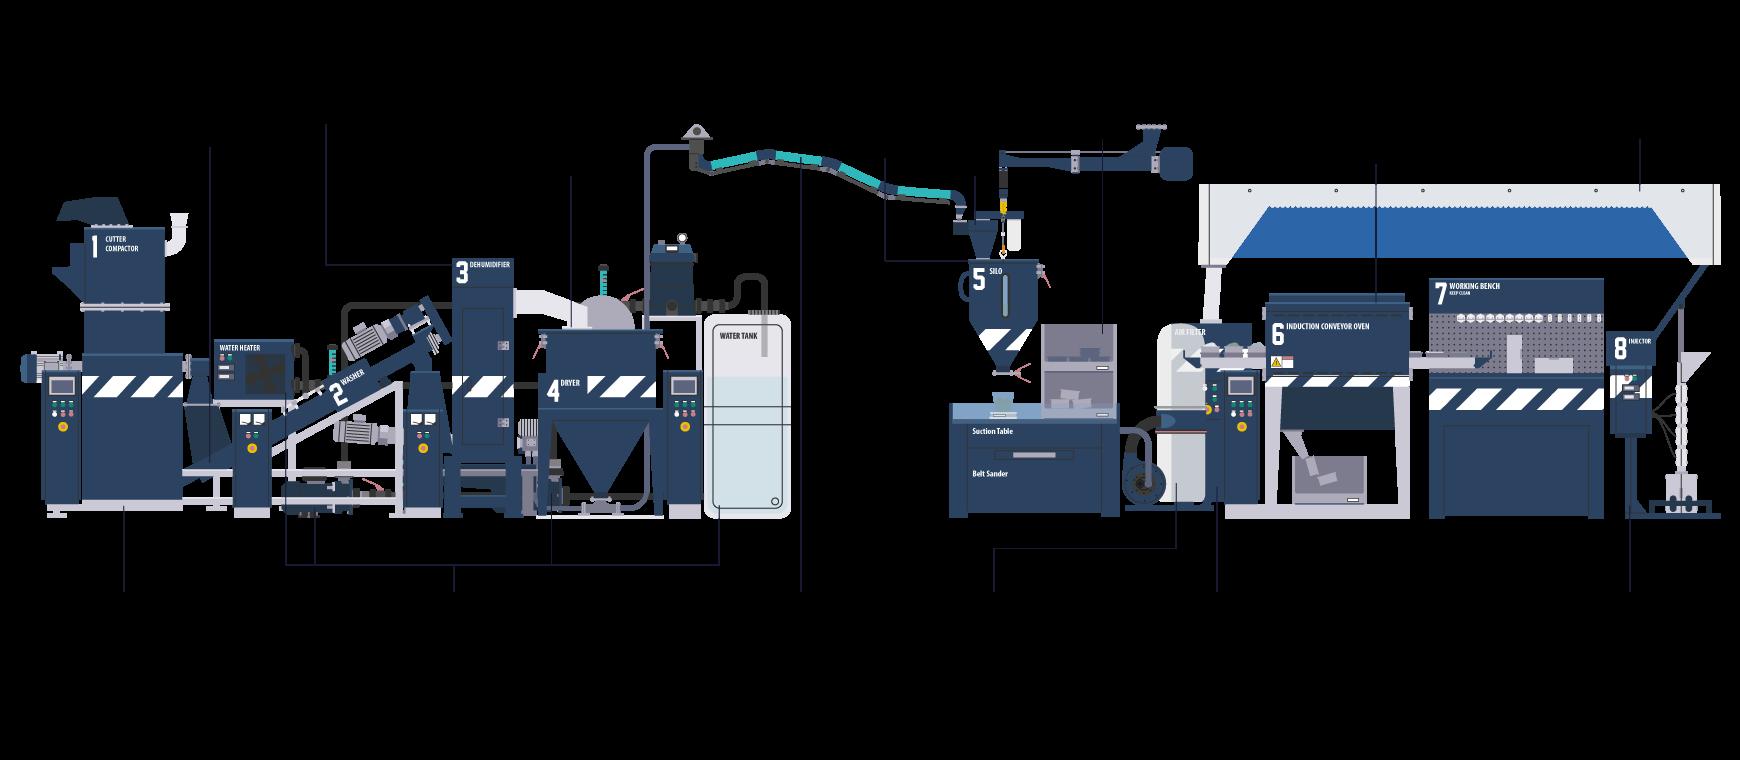 TRASH TECH - Trashpresso by Miniwiz